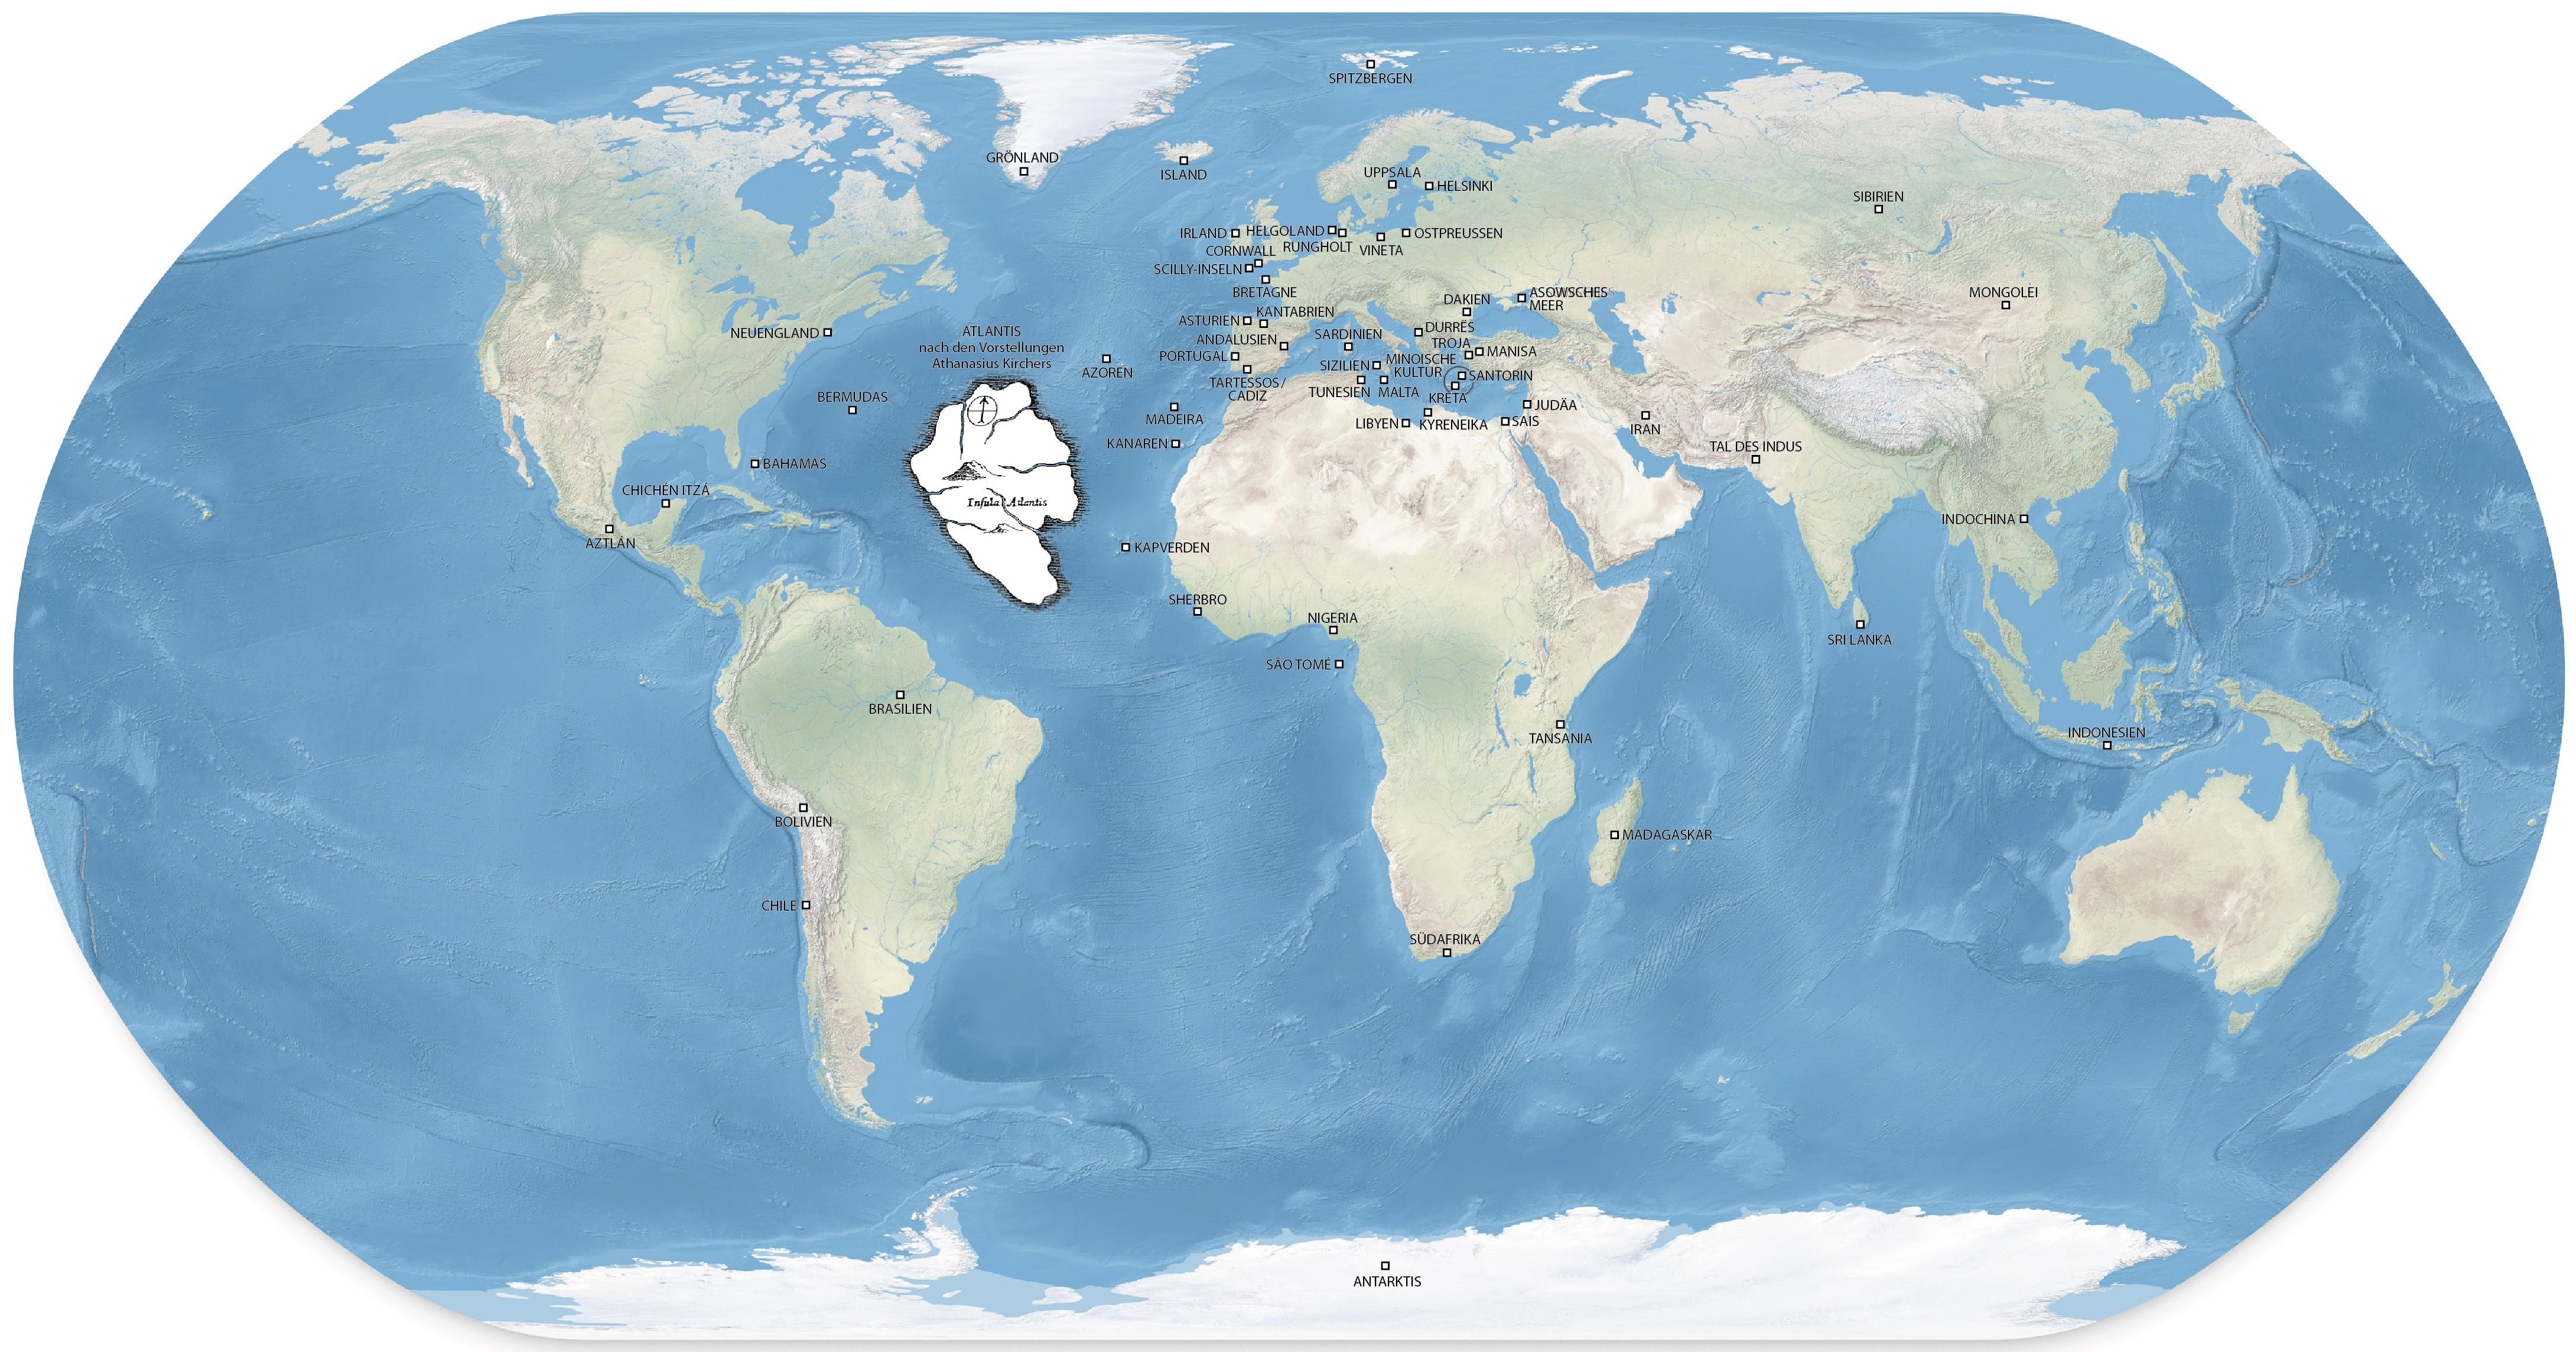 Location Hypotheses Of Atlantis Wikipedia The Free Encyclopedia